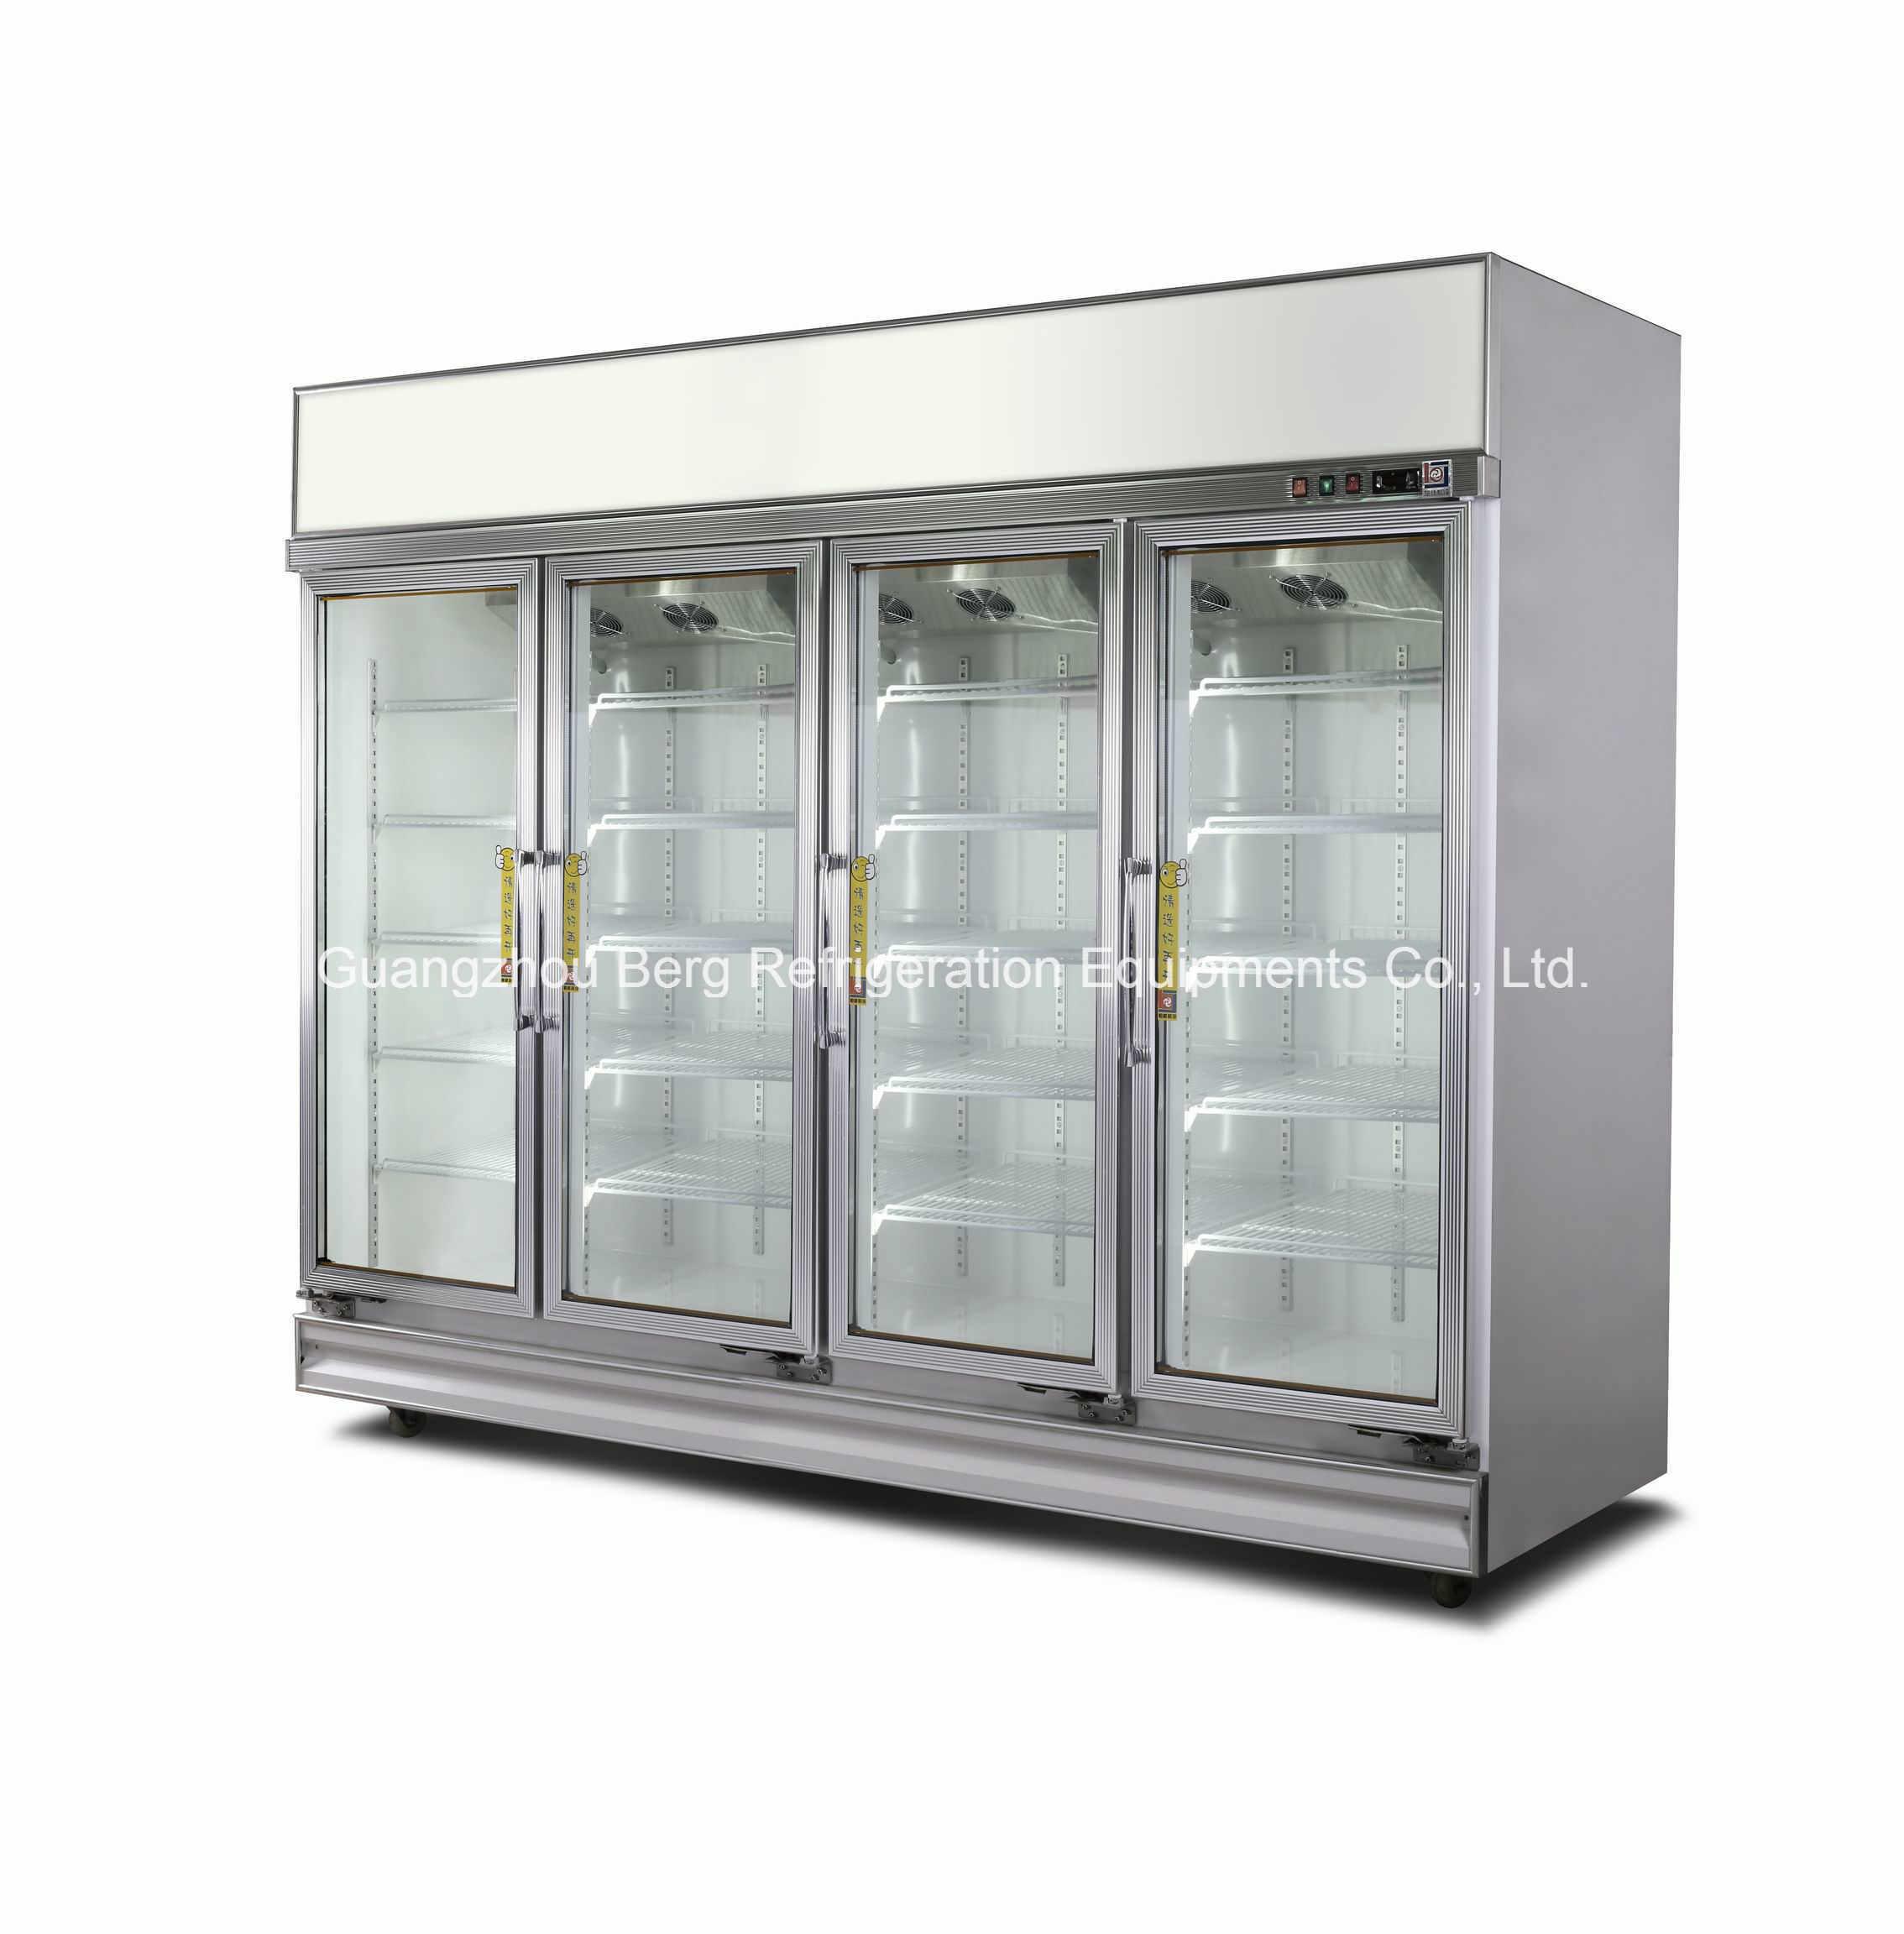 Food and Bverage Display Equipment